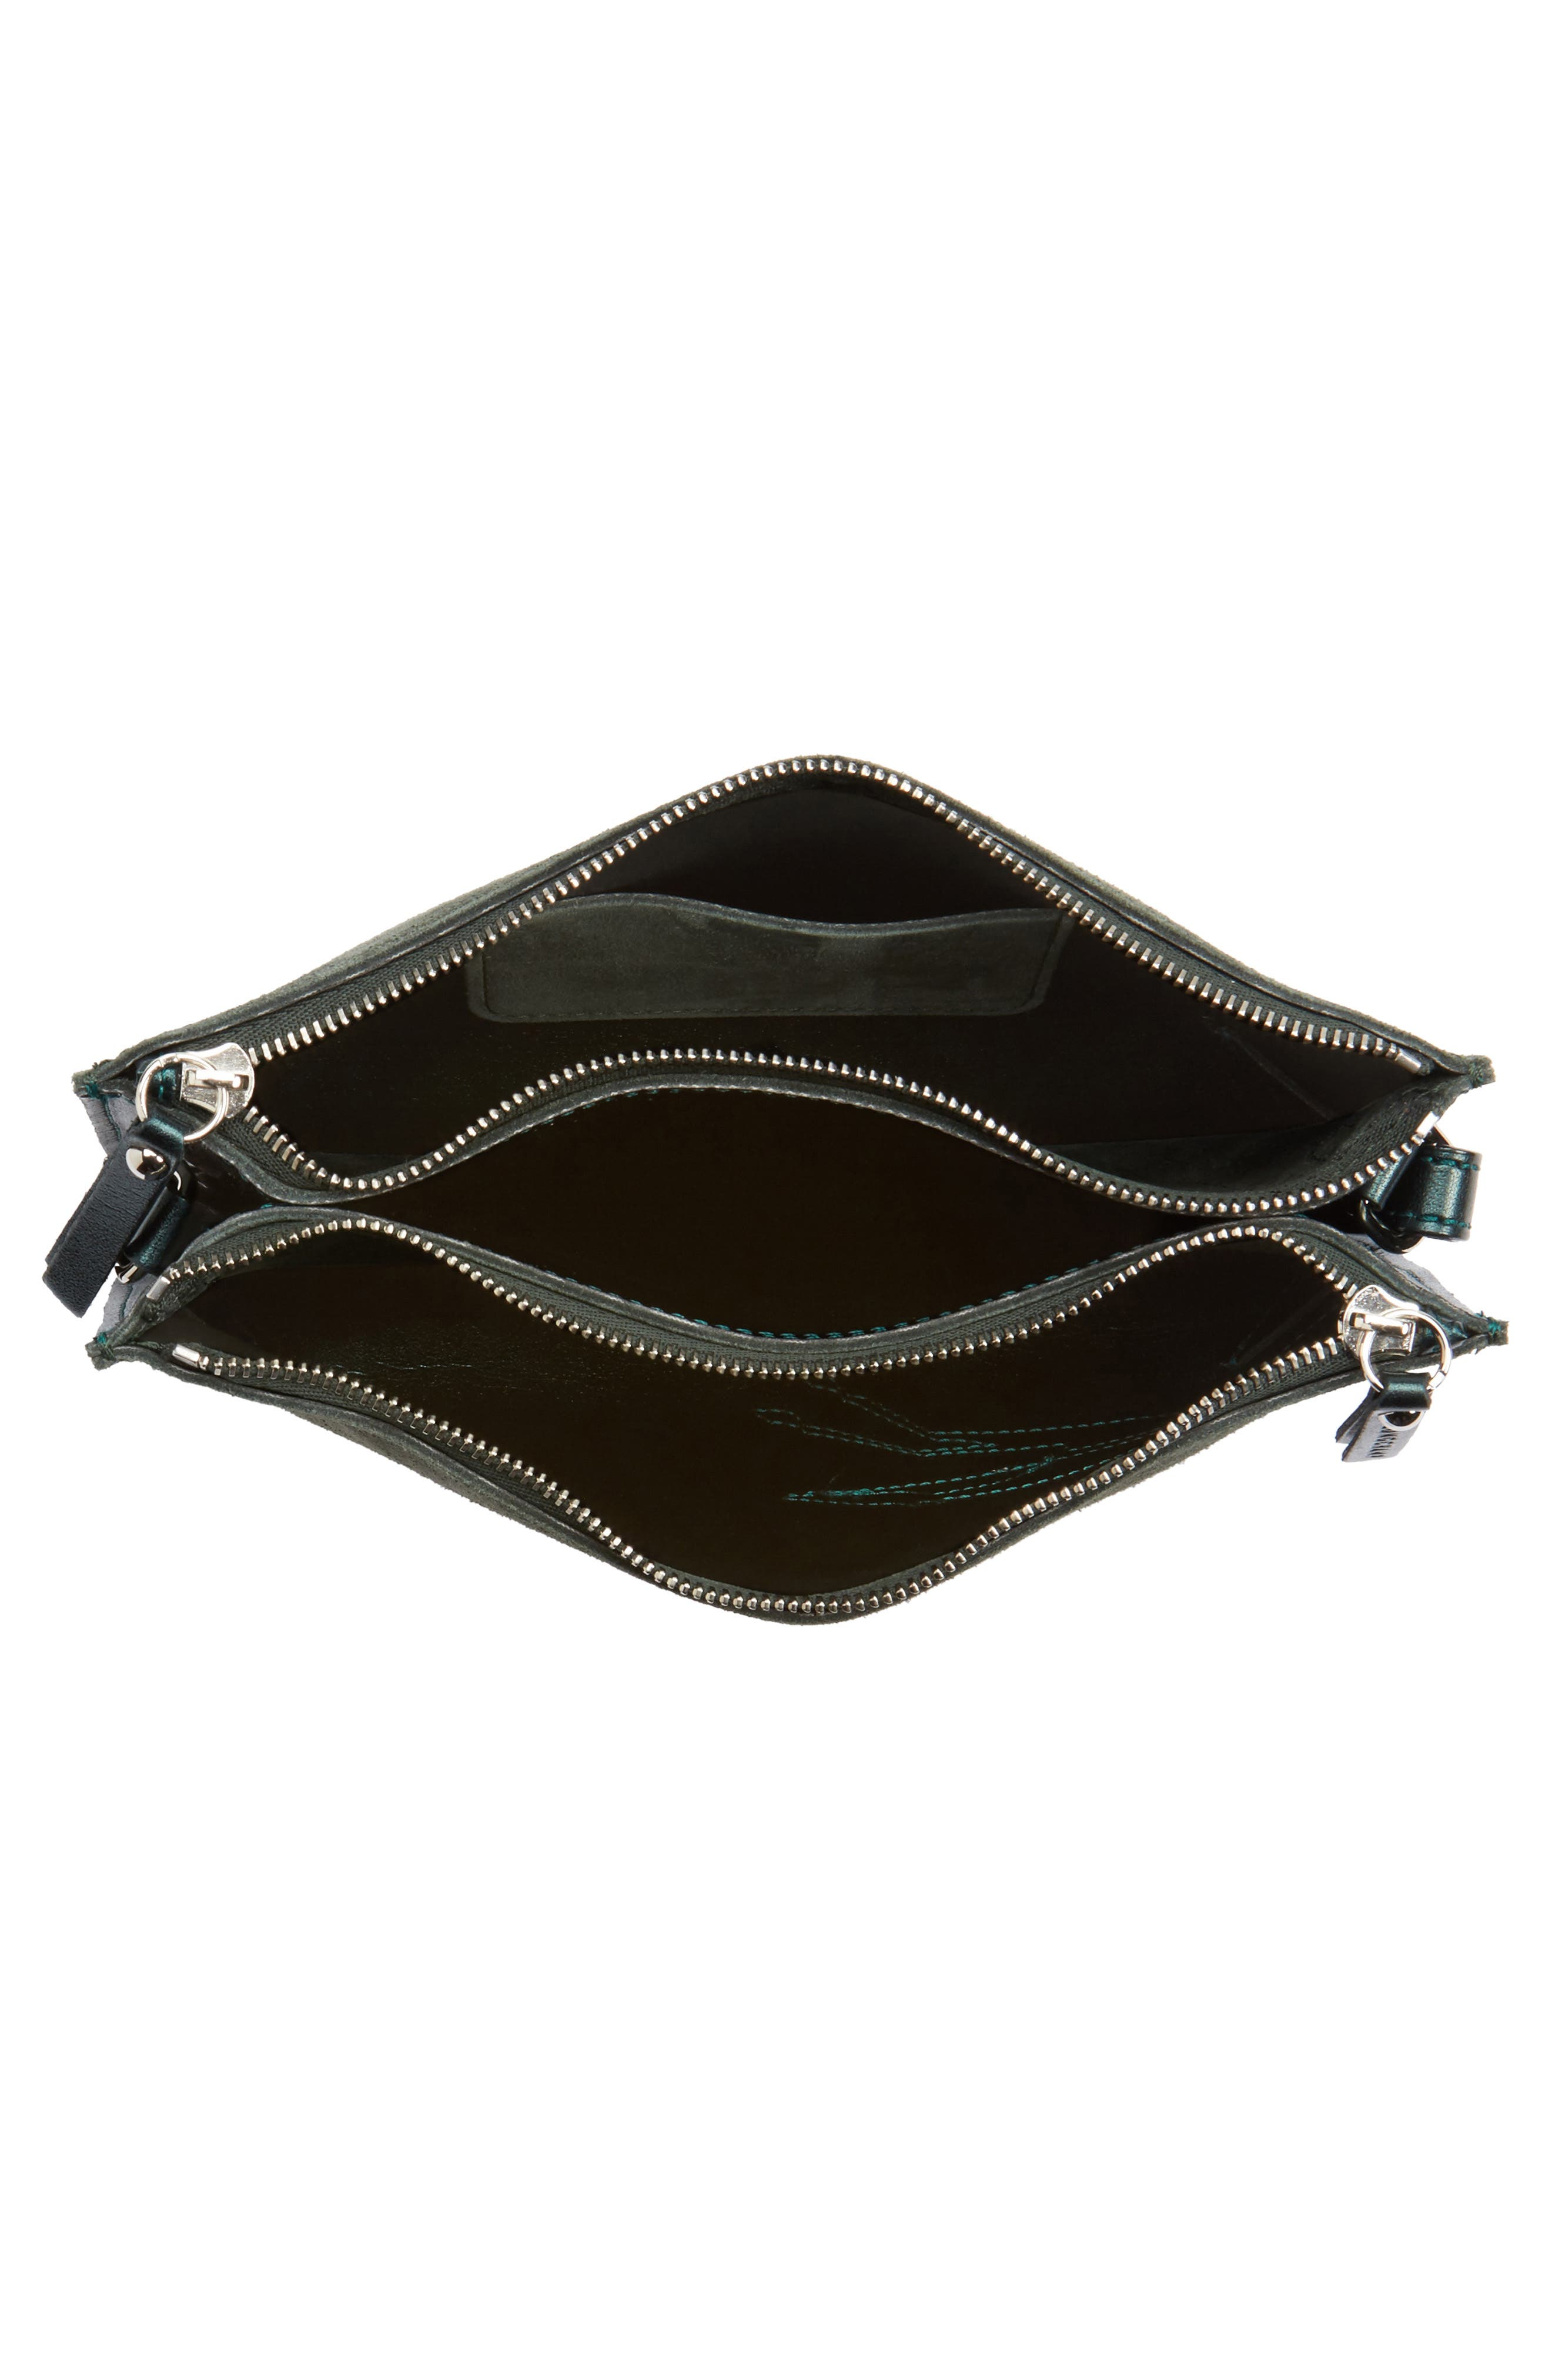 Alternate Image 3  - Longchamp Shop It Crossbody Bag